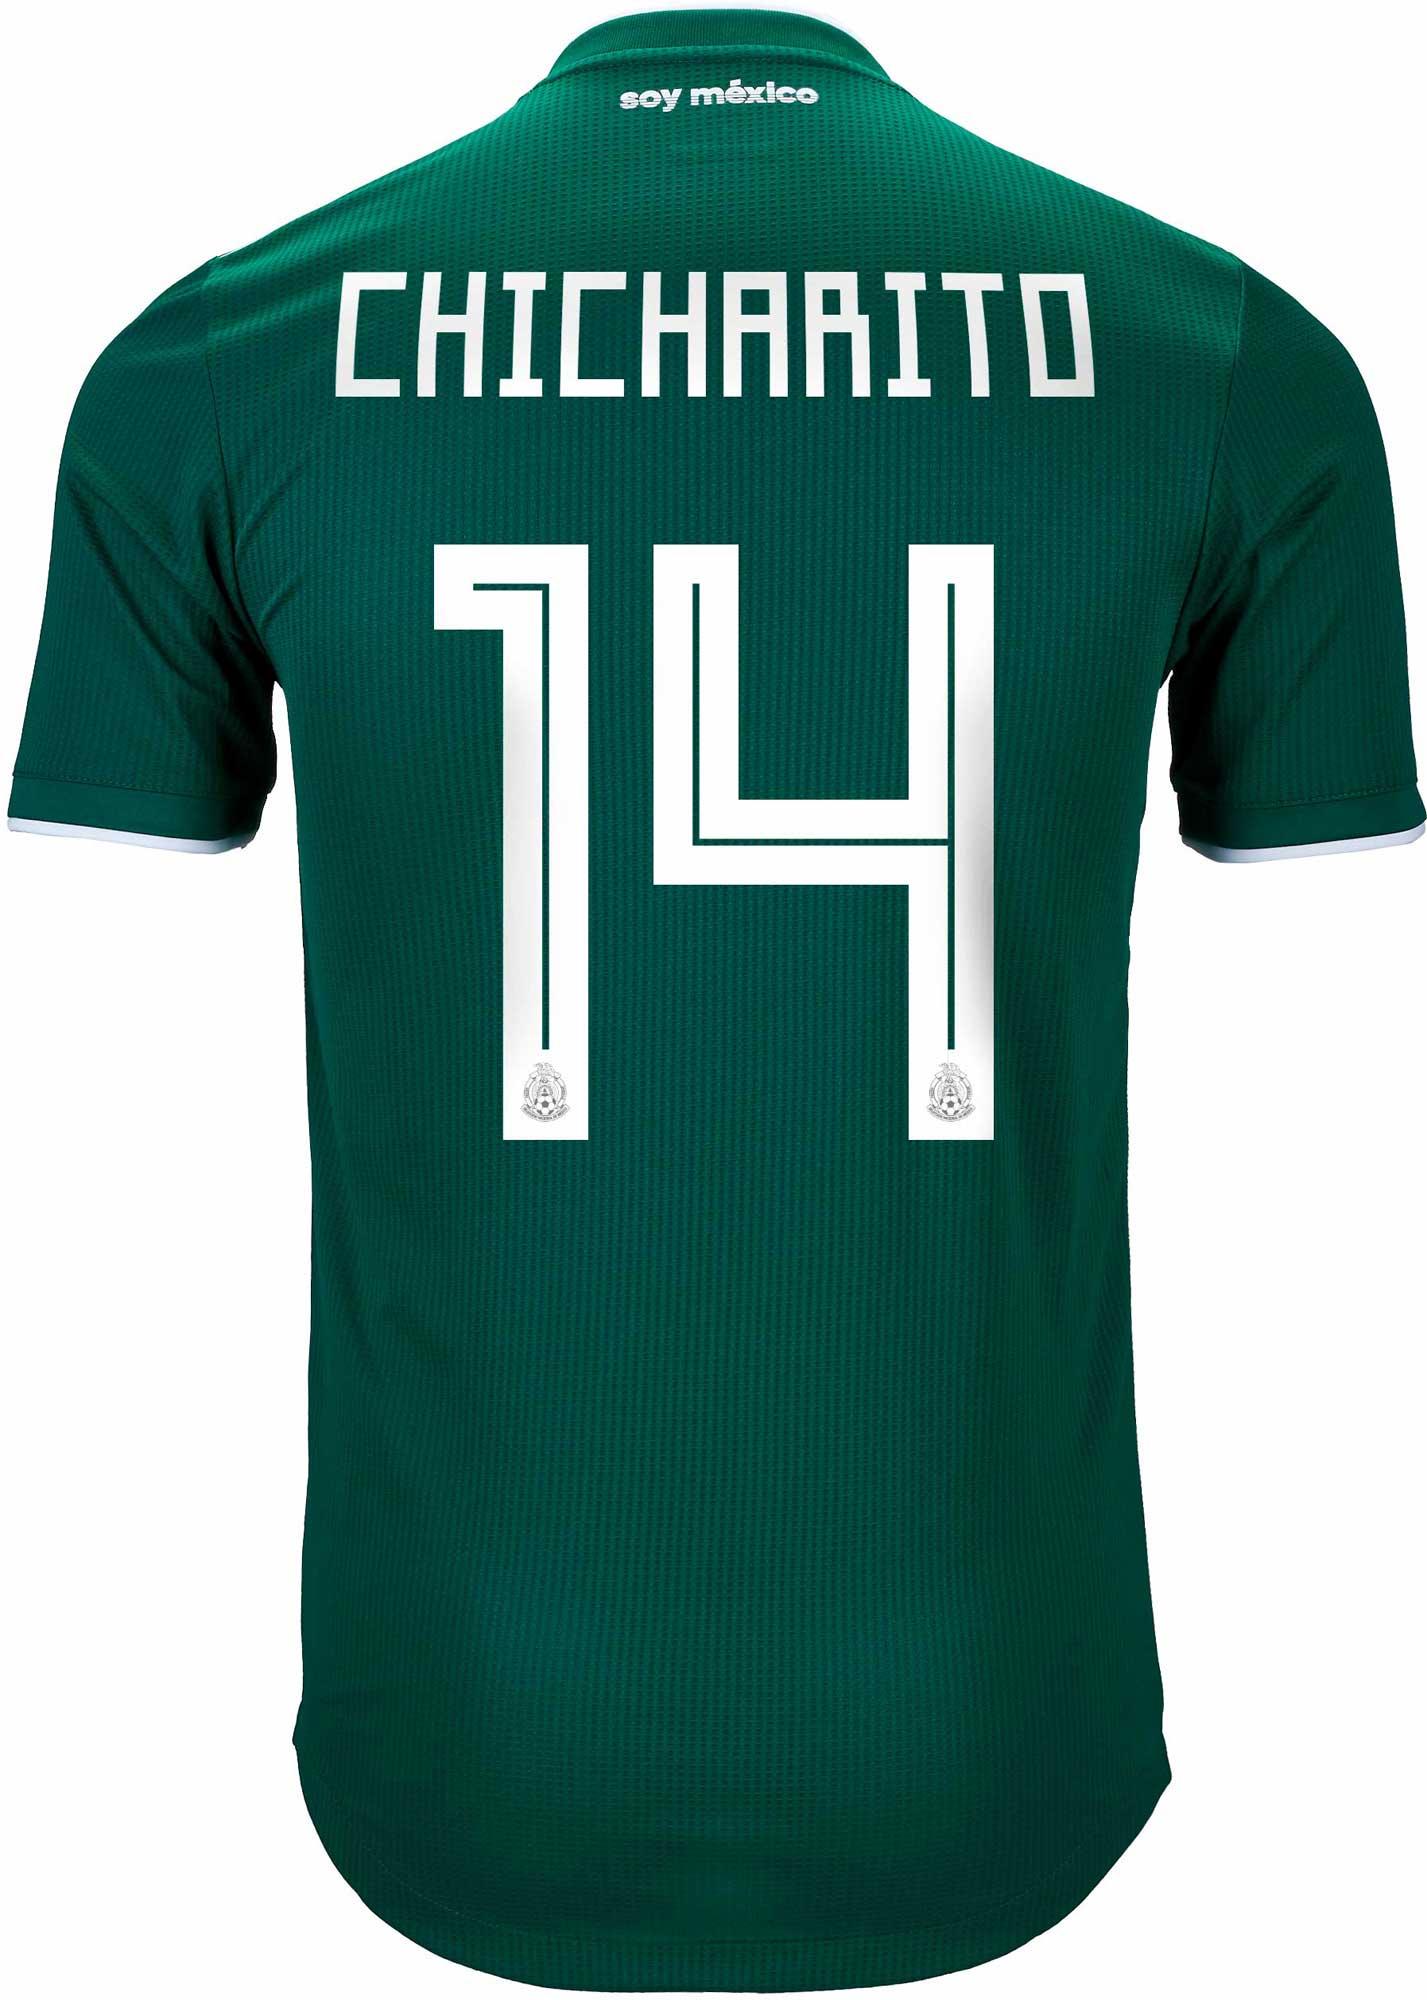 cdbaa64a039 2018 19 adidas Chicharito Mexico Authentic Home Jersey - SoccerPro